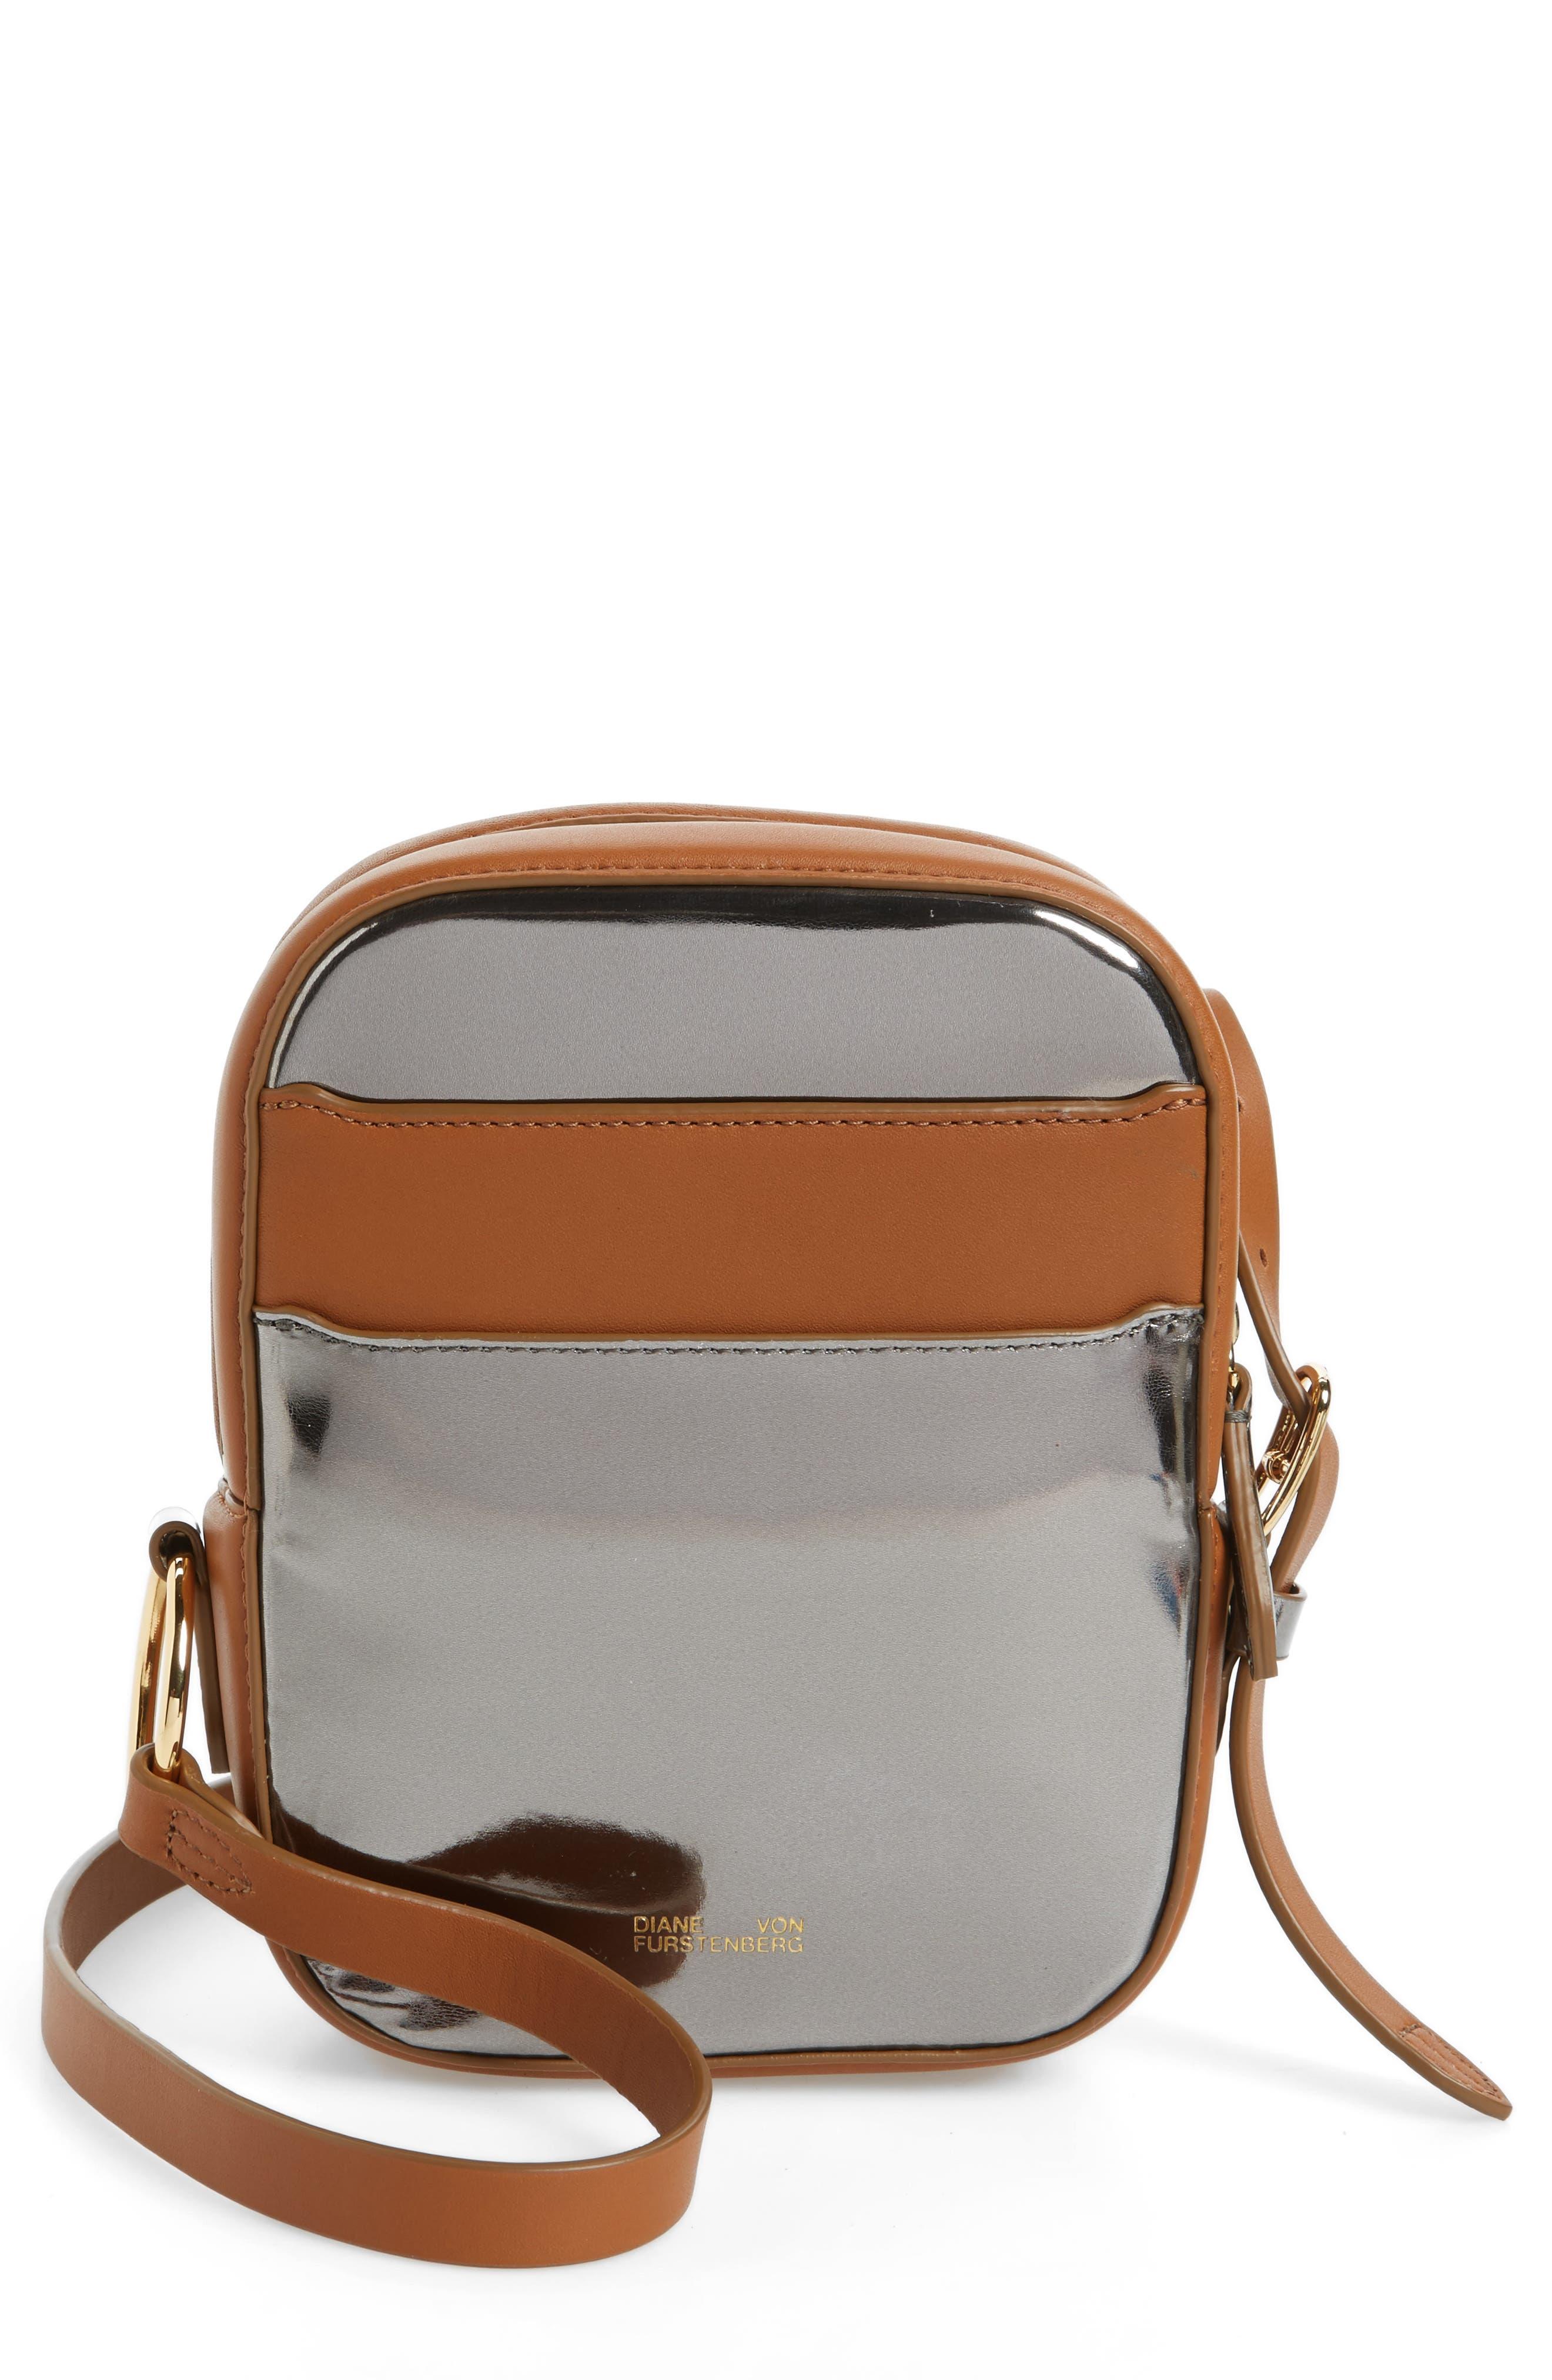 Specchio Leather Camera Bag,                             Main thumbnail 1, color,                             040